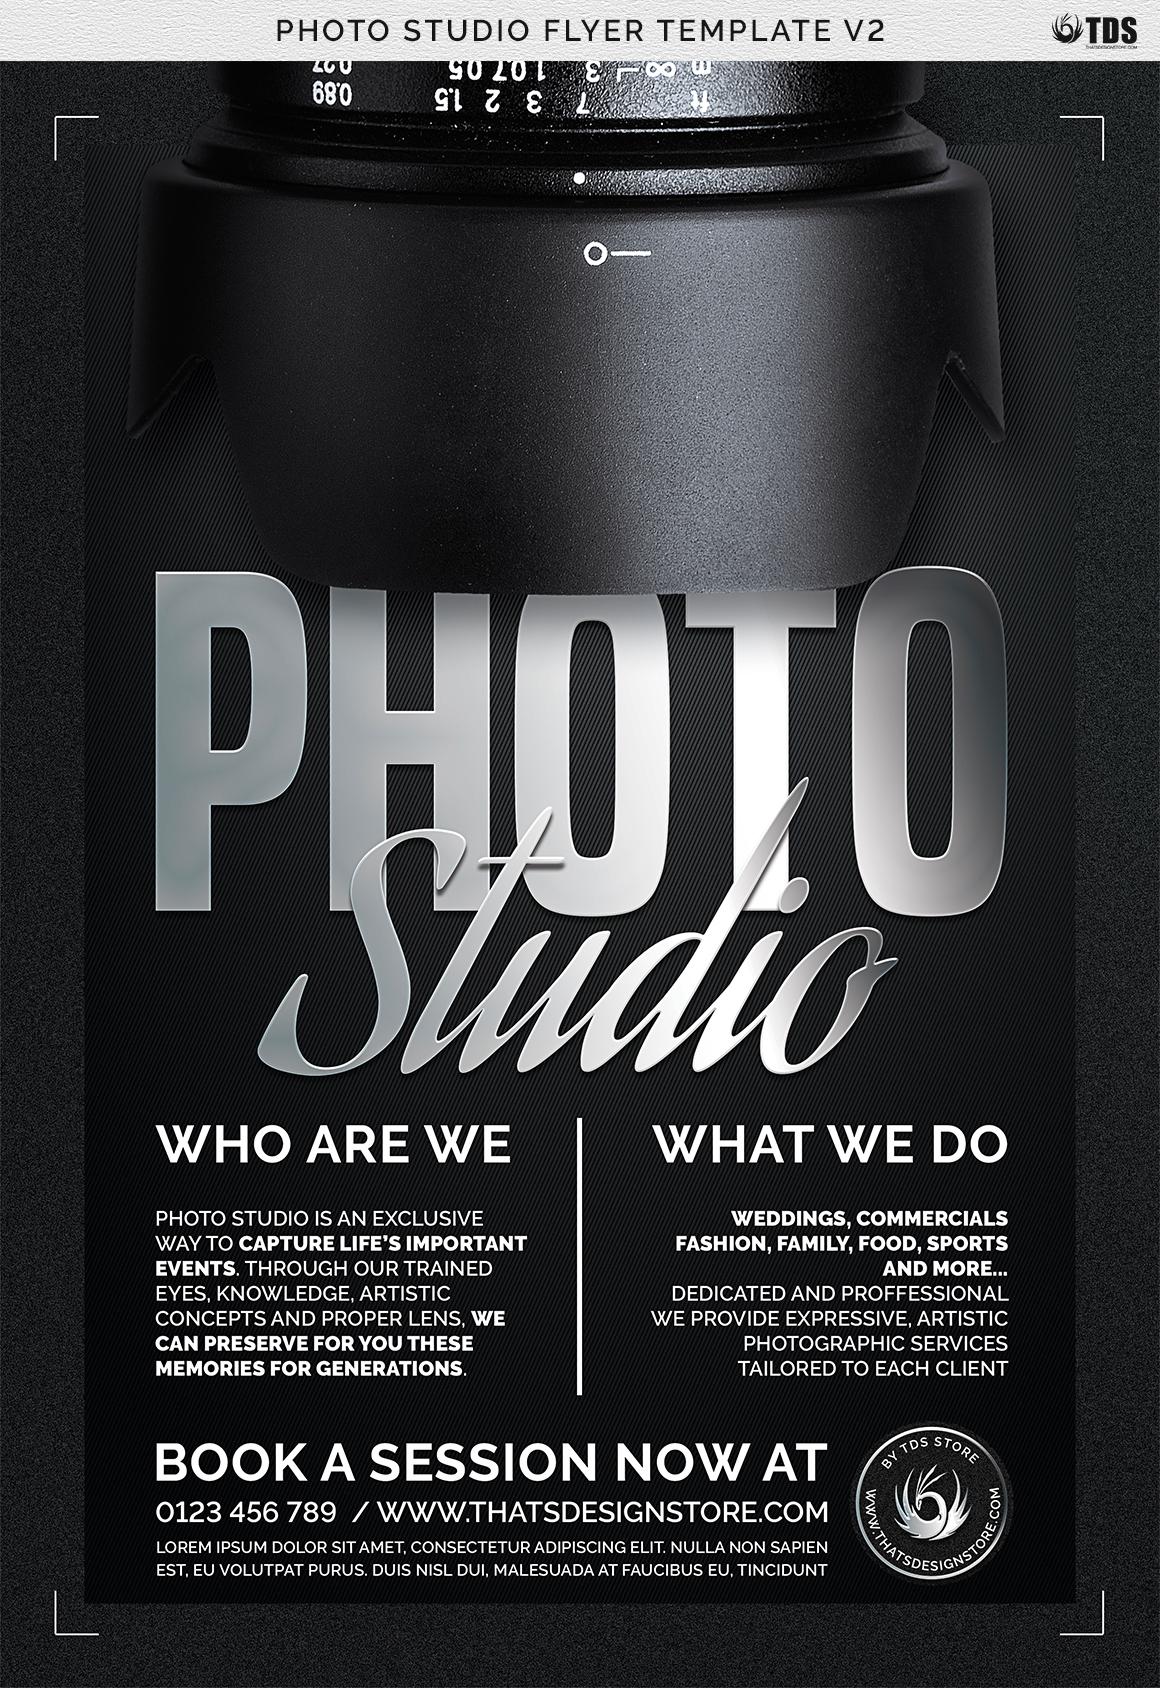 Photo Studio Flyer Template V2 example image 7